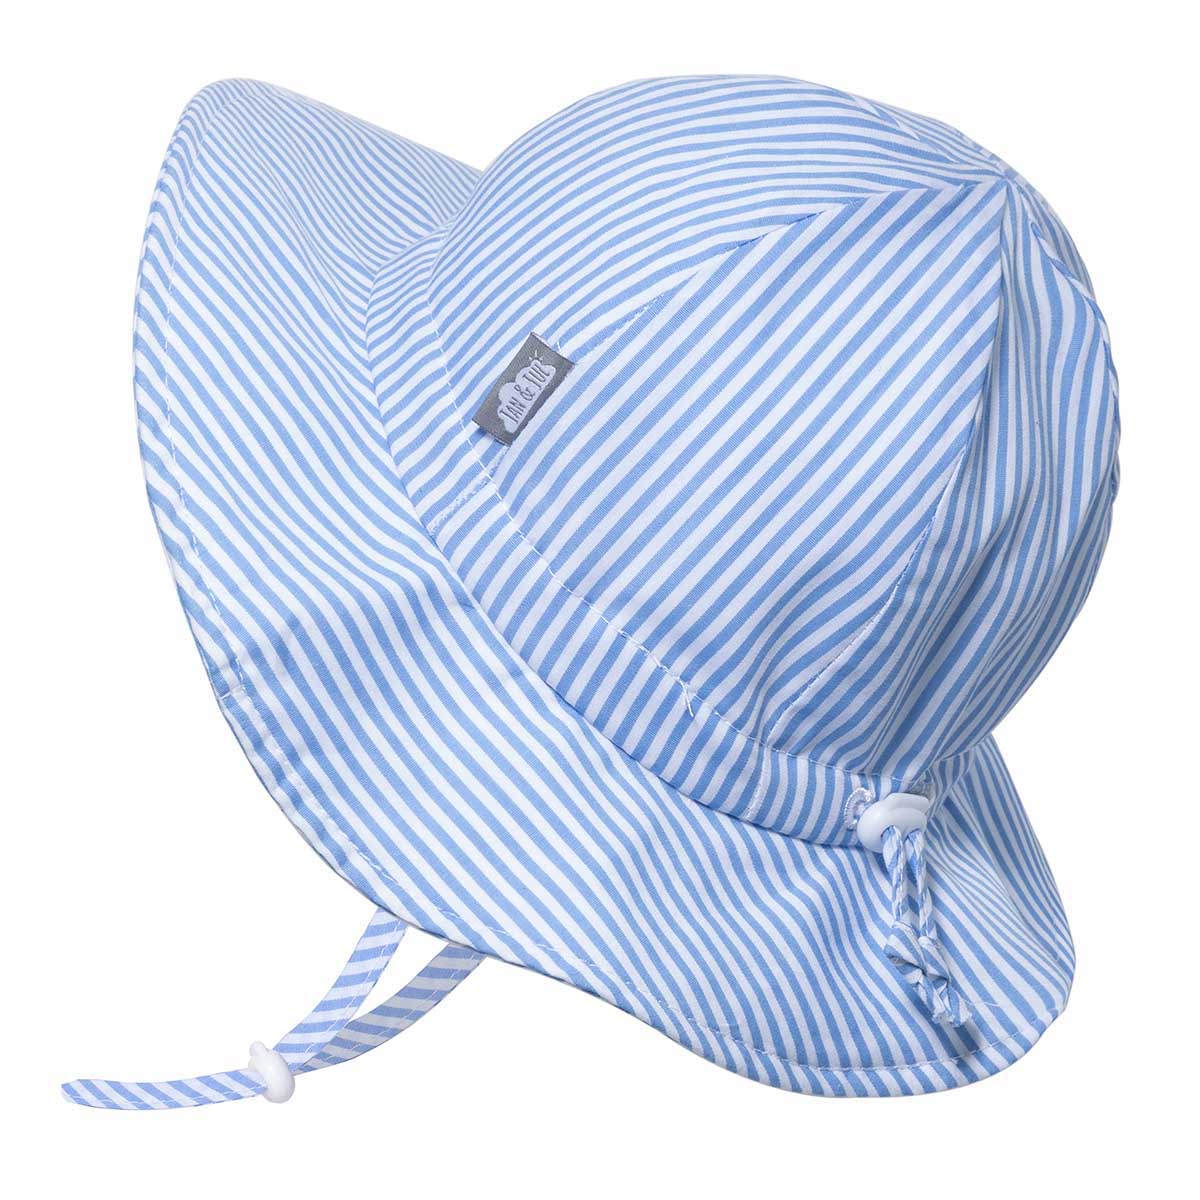 Kids/' Aqua-Dry Sun-Hat with UV Protection Adjustable Straps Jan /& Jul Baby Toddler